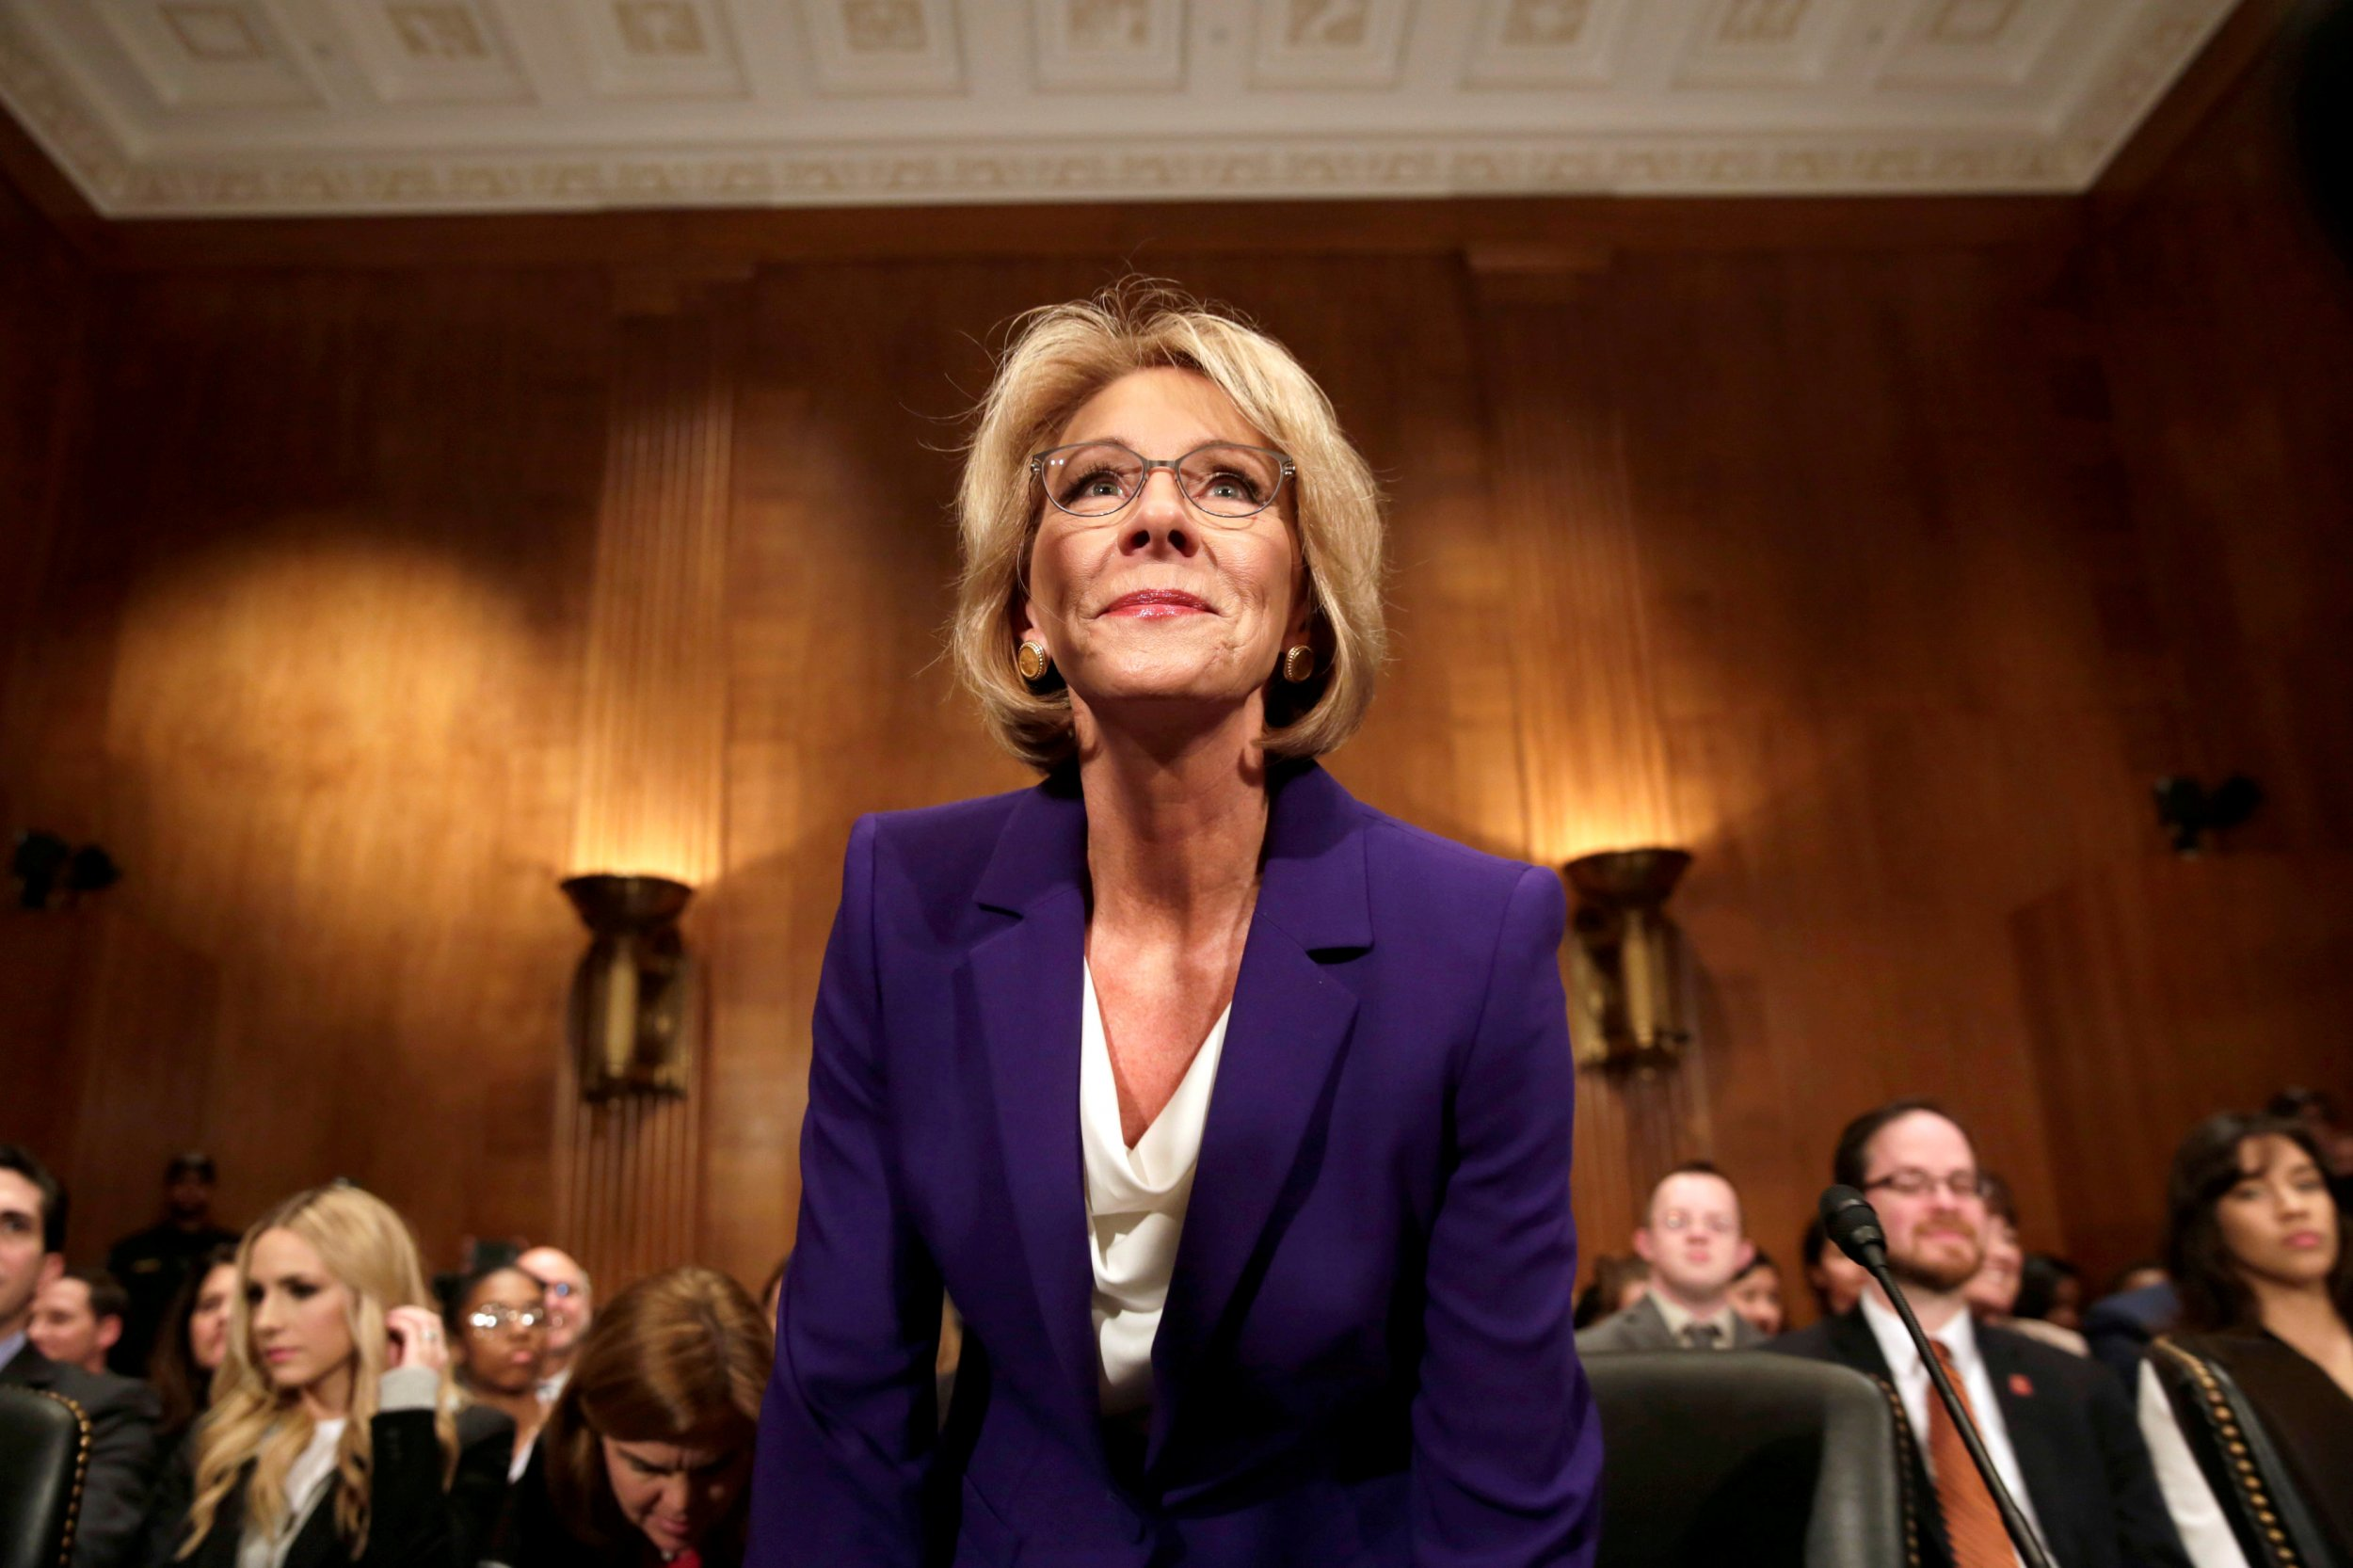 Our Next Secretary Of Education Should >> Betsy Devos Narrowly Confirmed As Education Secretary